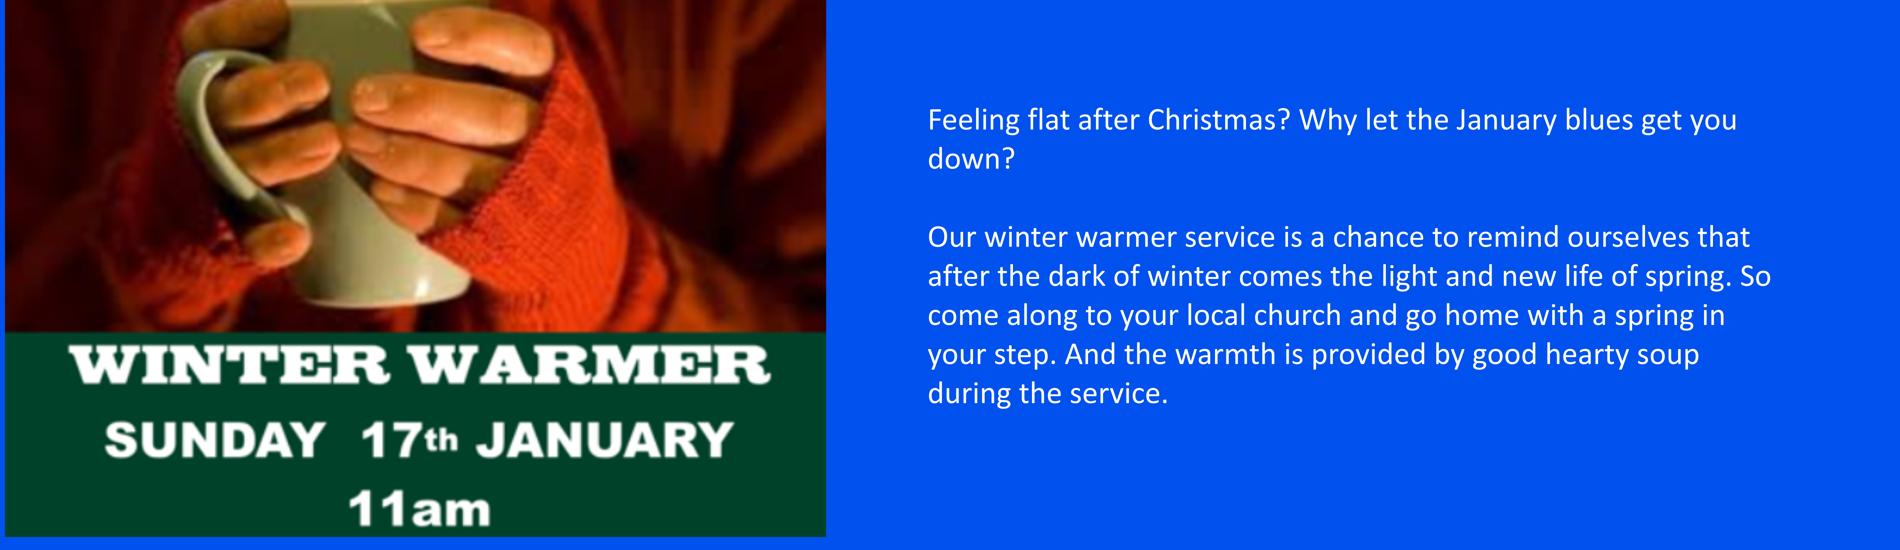 winterwarmerslider